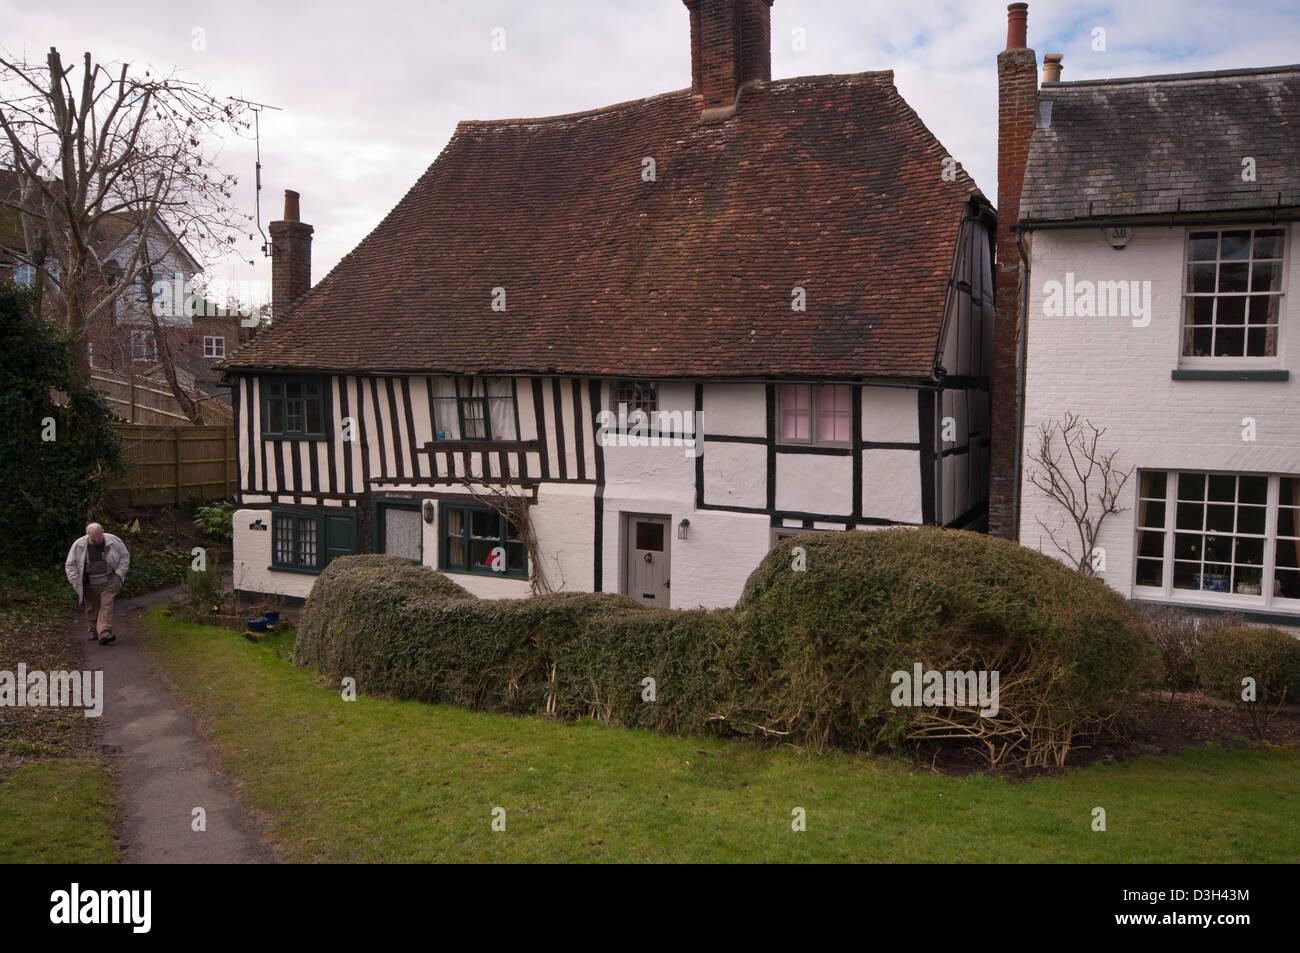 Period Tudor House - Stock Image